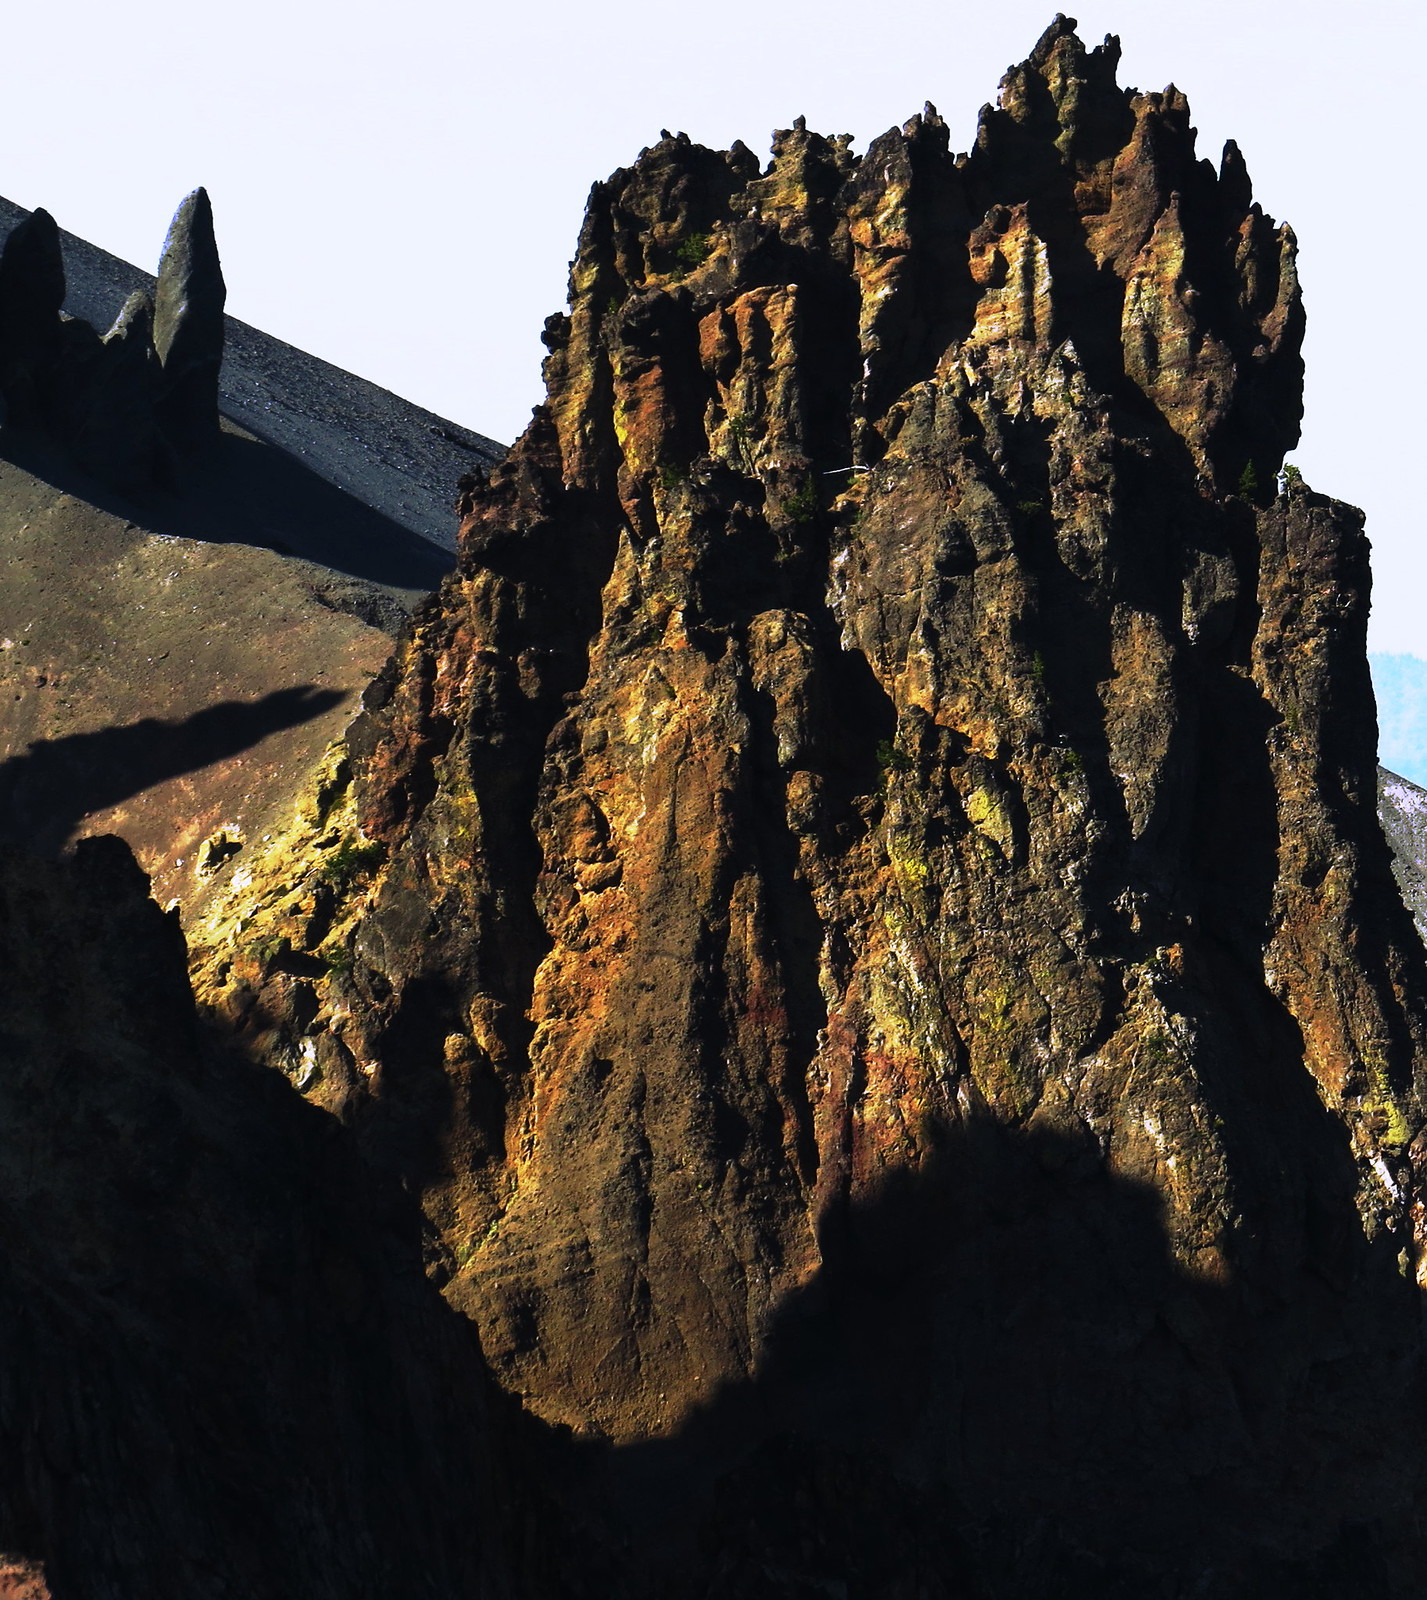 Liao Rock, Crater Lake, Oregon